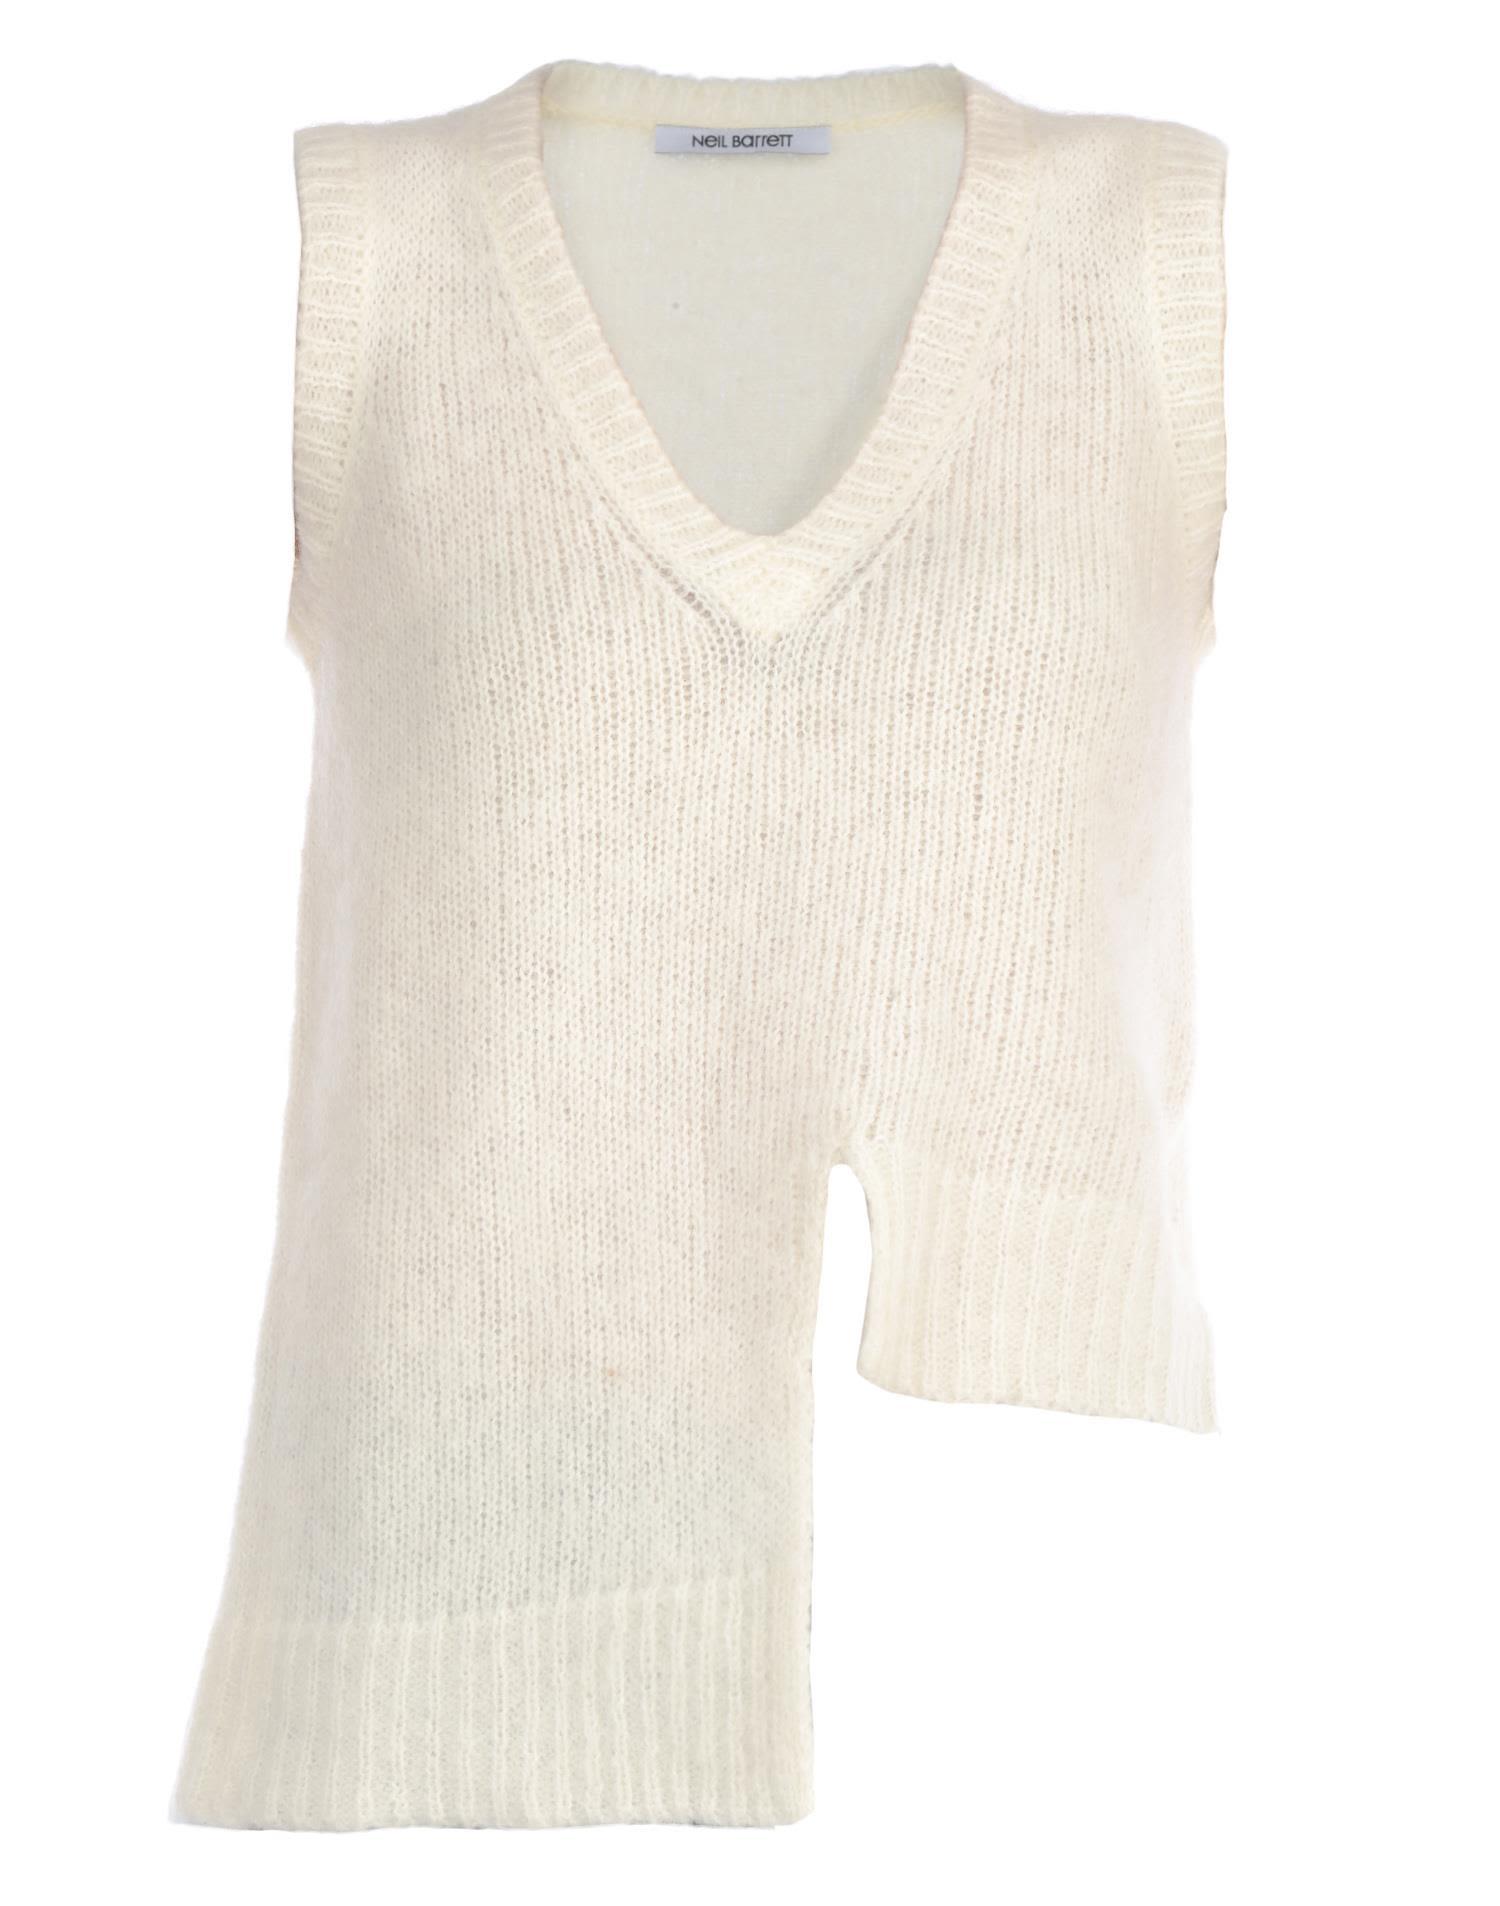 Neil Barrett Knitted Top